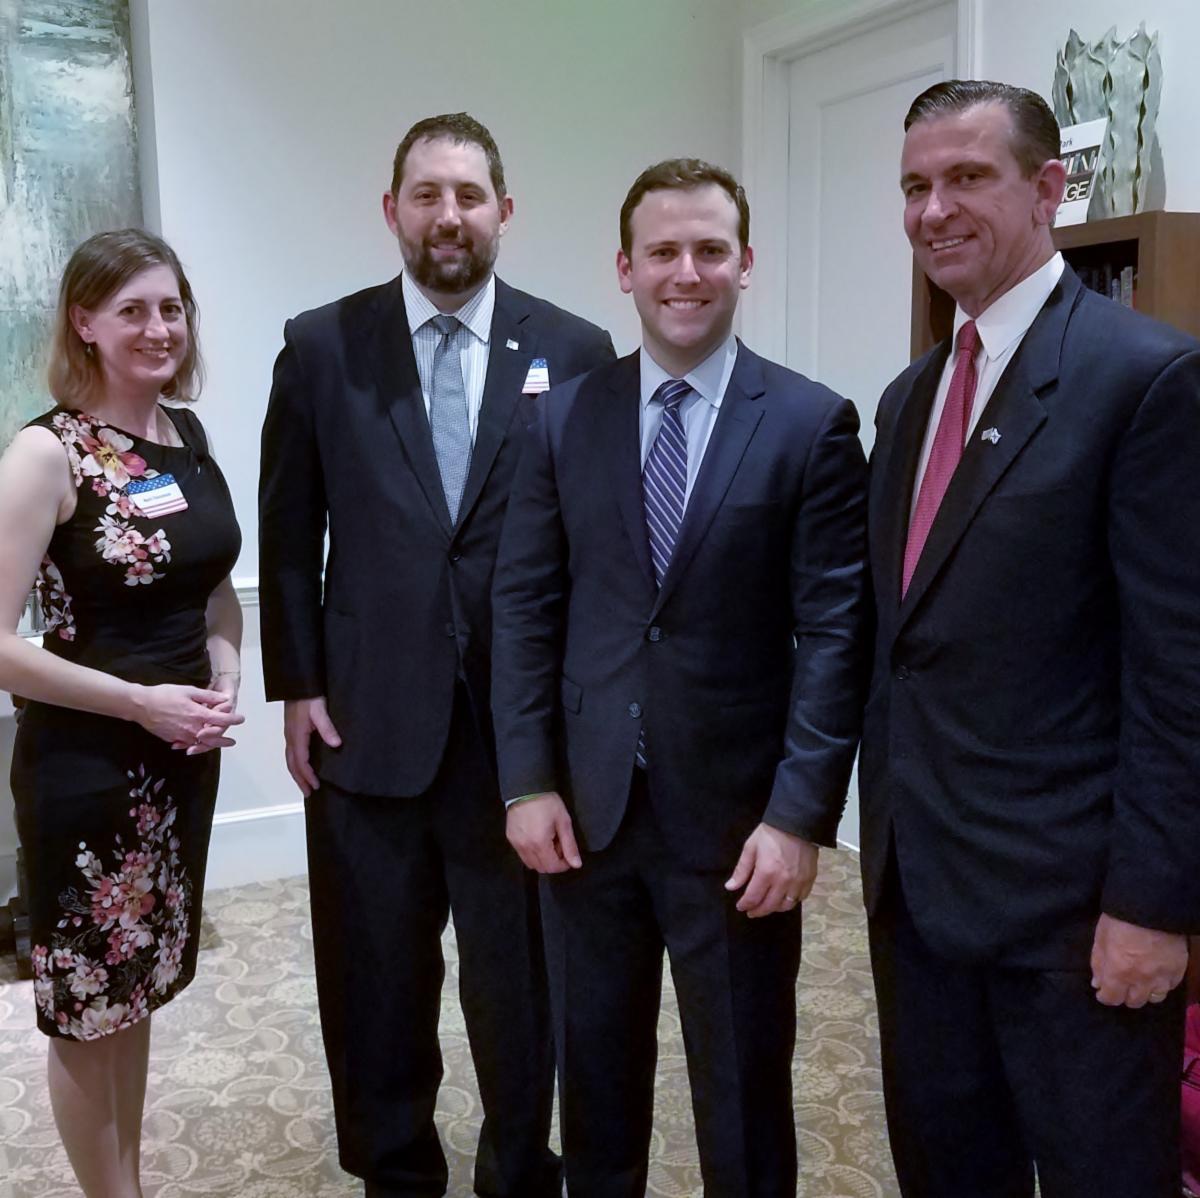 April Donahue, Dr. Stephen Schwartz, Chris Sprowls, incoming Florida House Speaker, Representative Bob Rommel